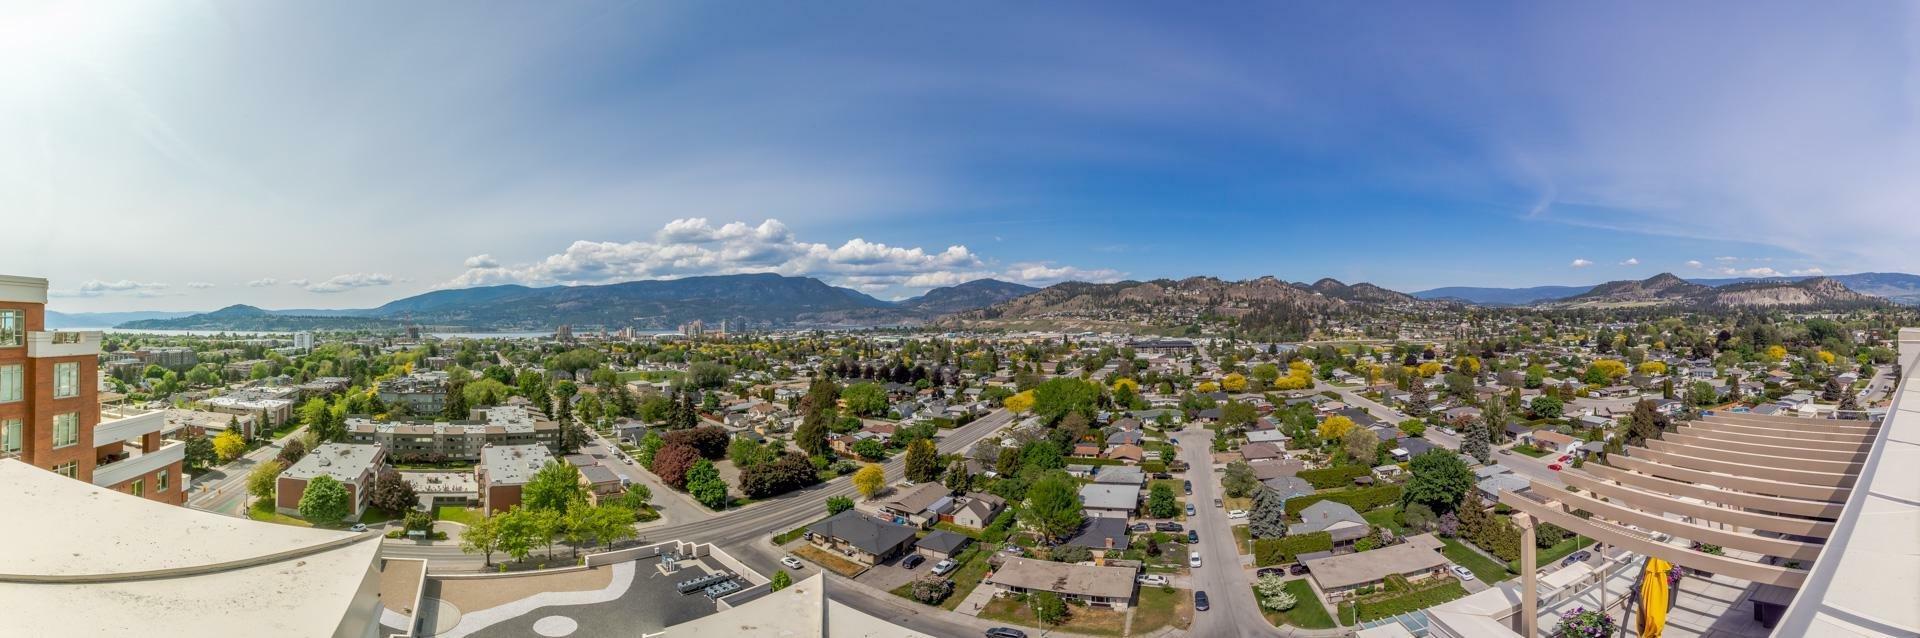 Condo in Kelowna, British Columbia, Canada 1